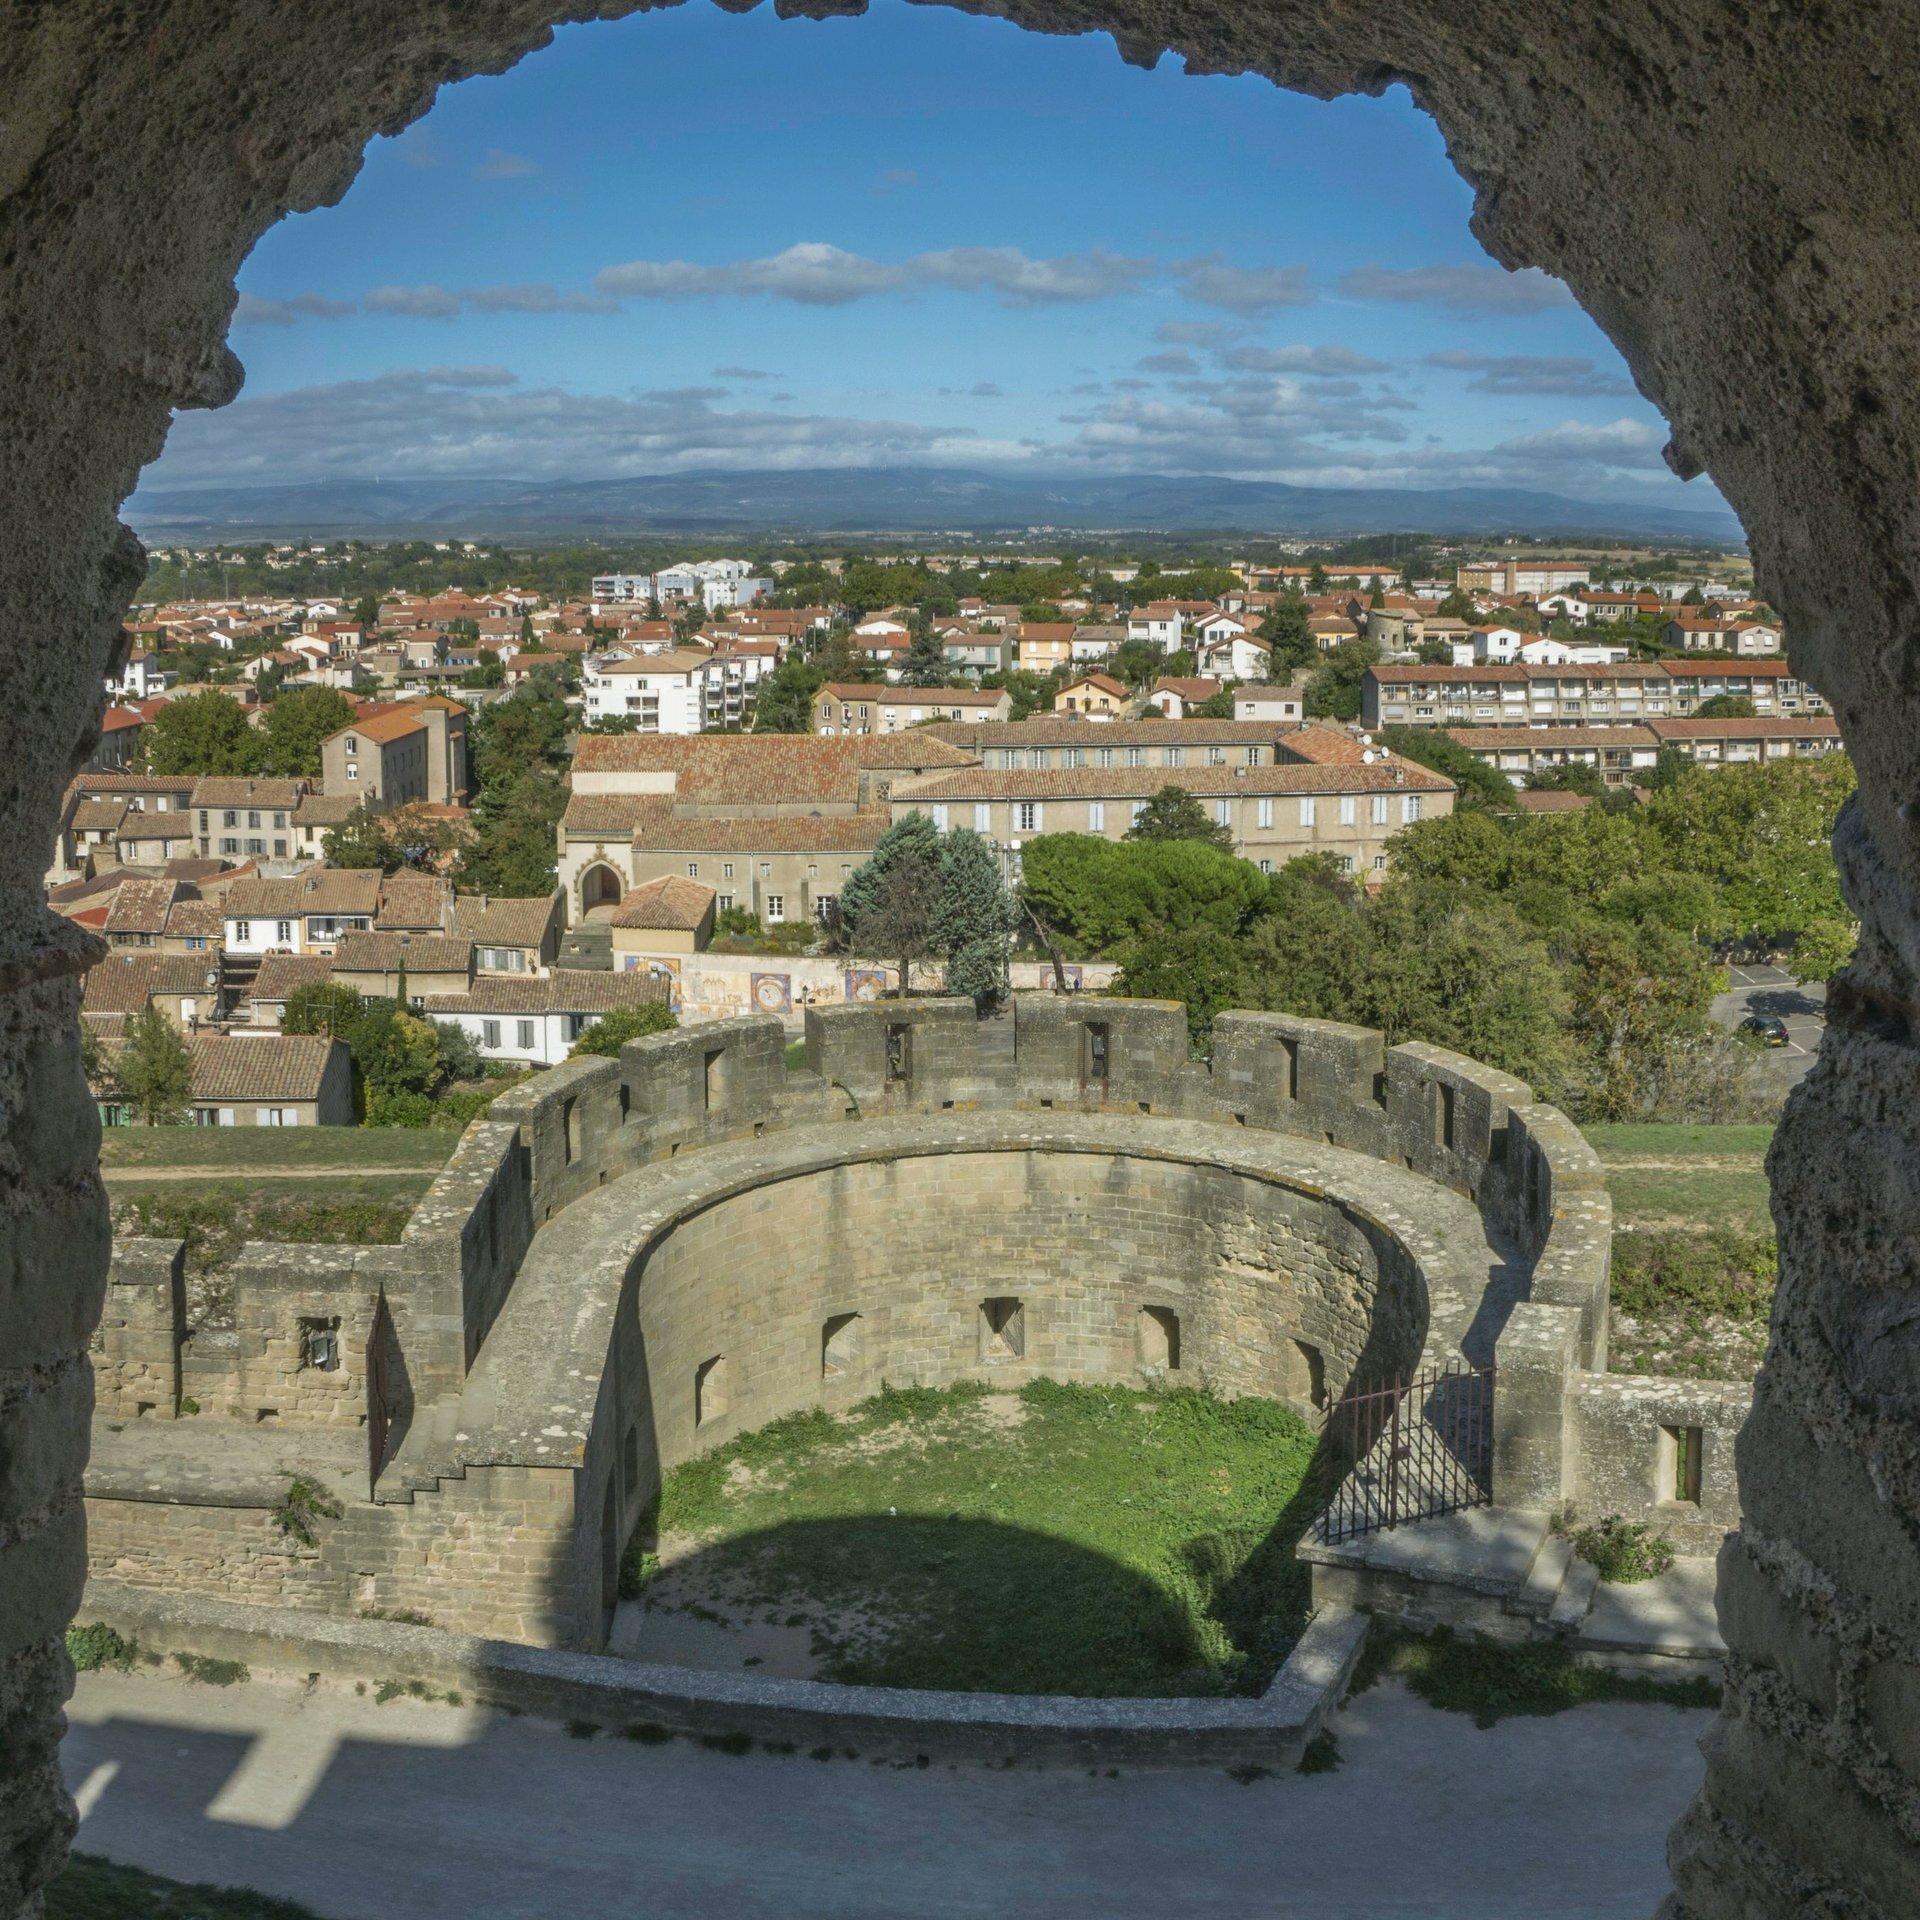 Blick auf die Barbacane Notre-Dame der Cité Carcassonne